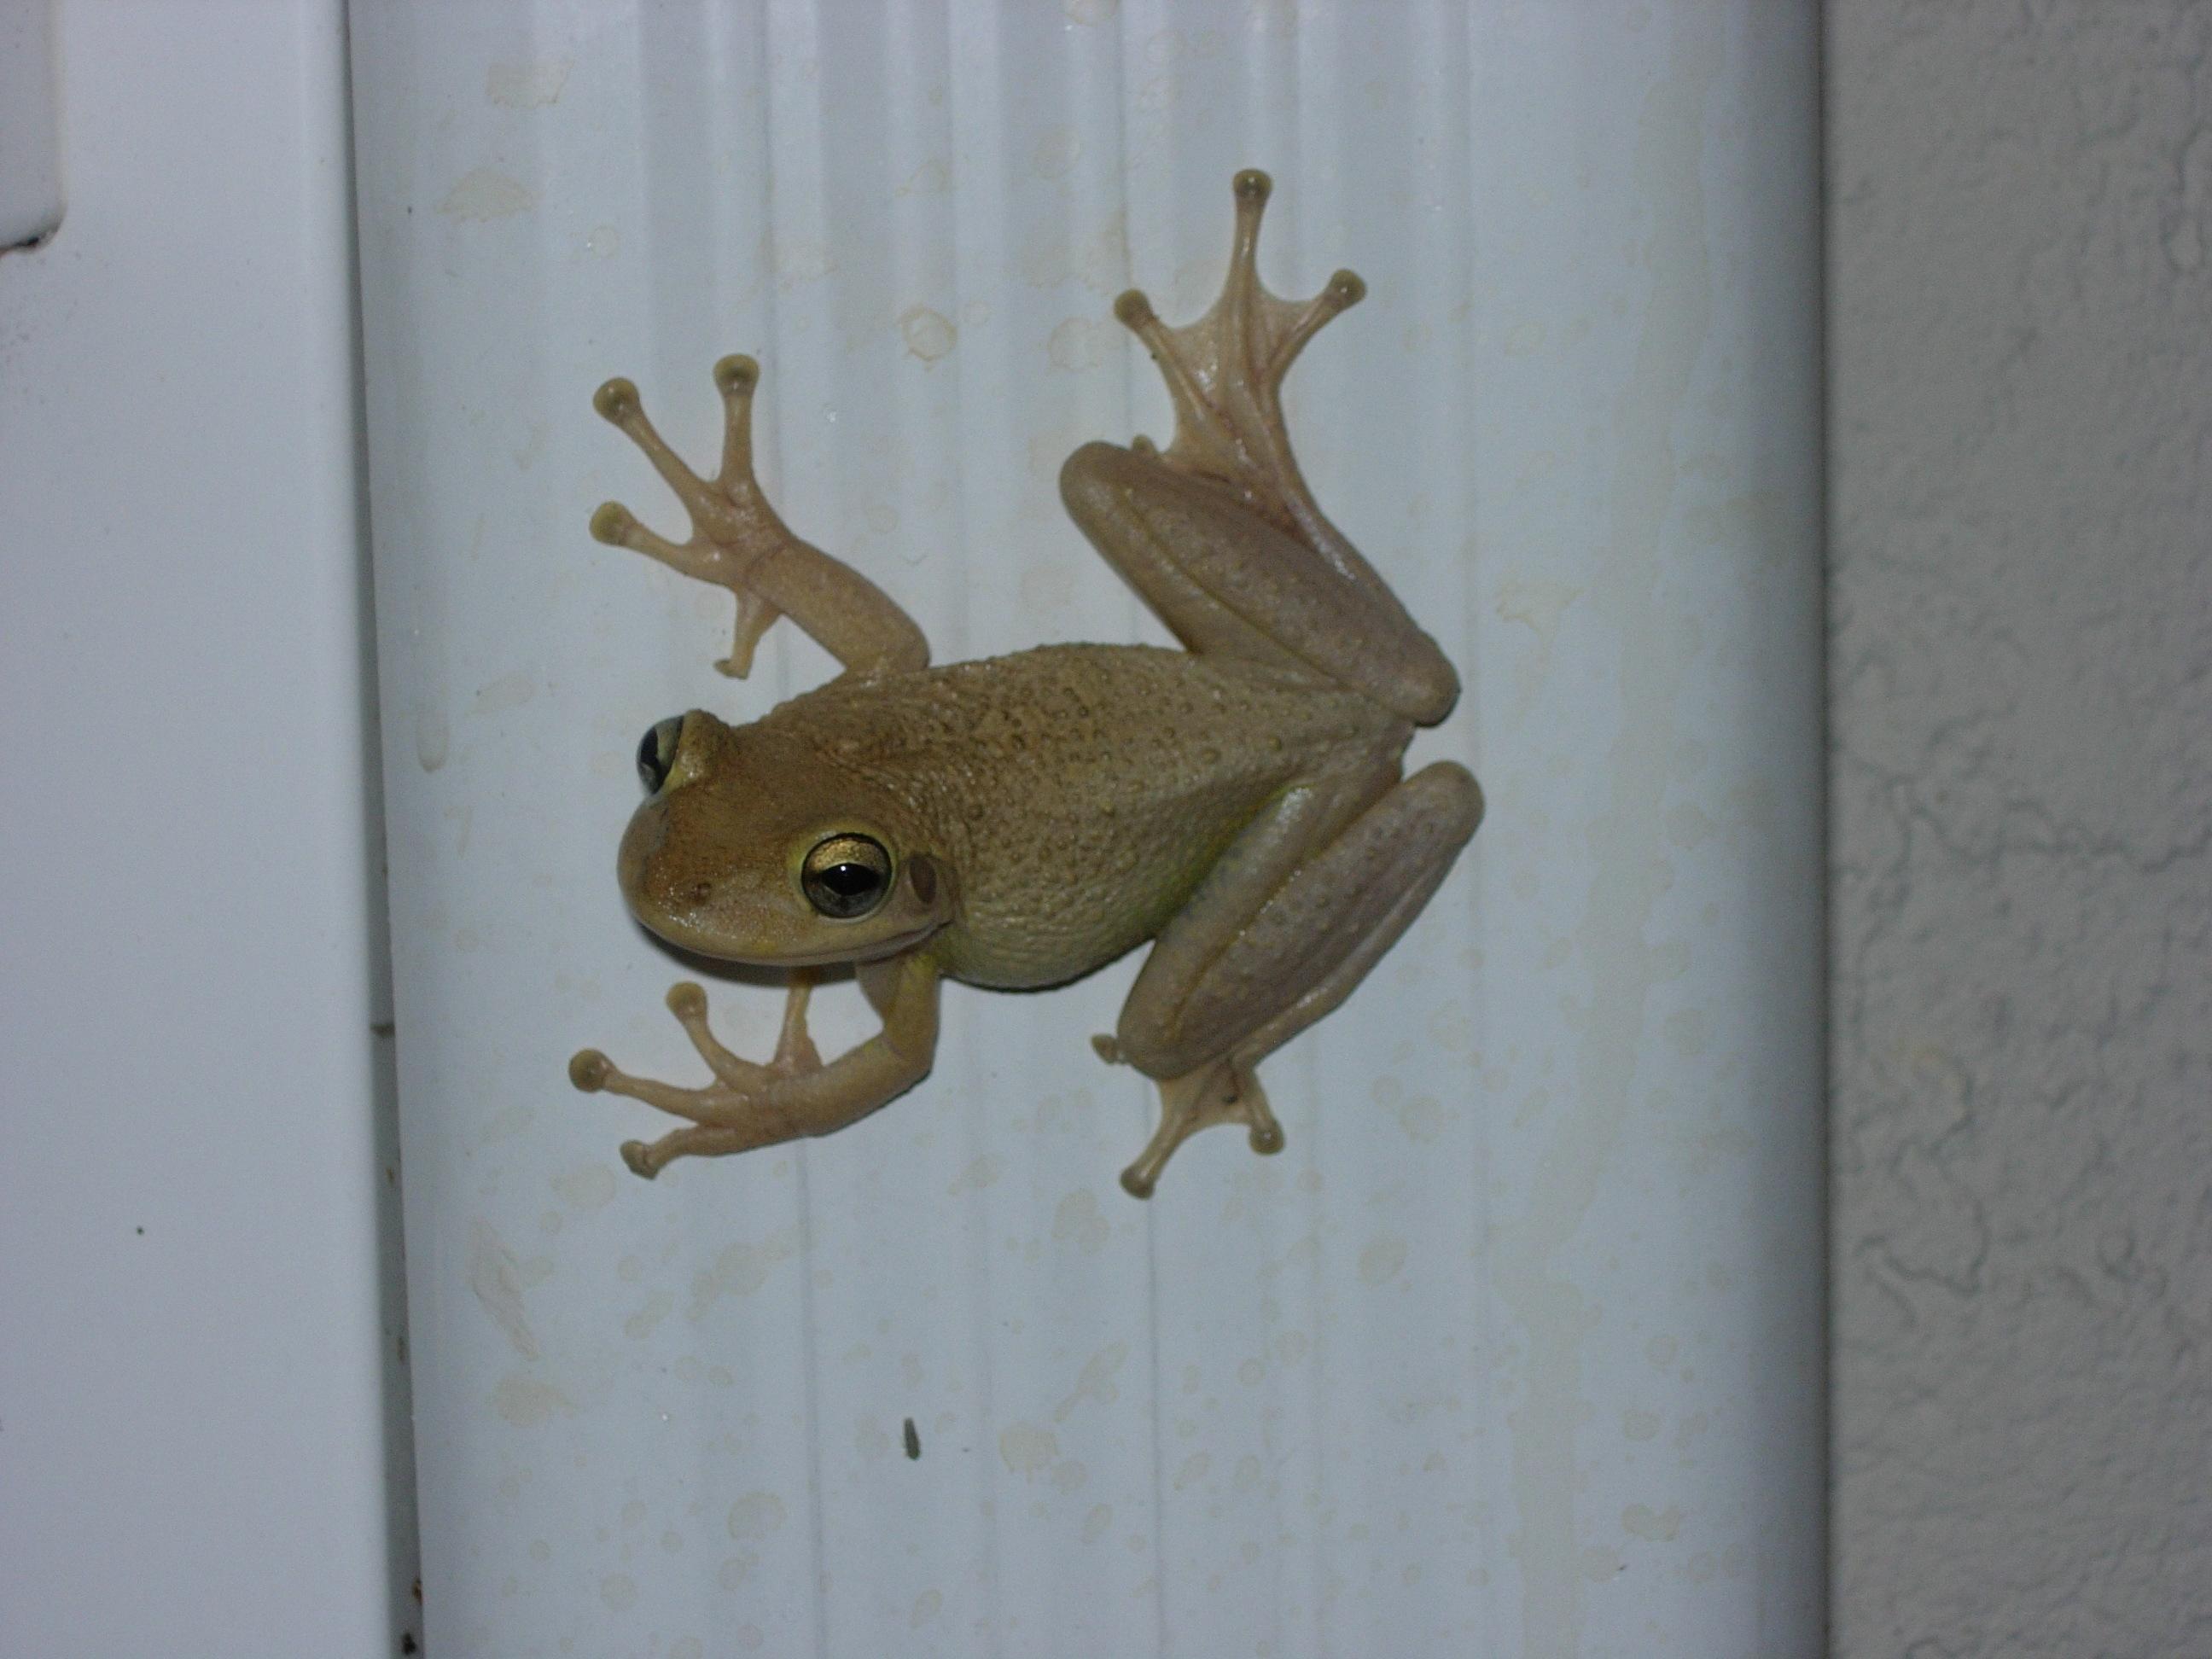 EDRR Invasive Species of the Month – Cuban Treefrog